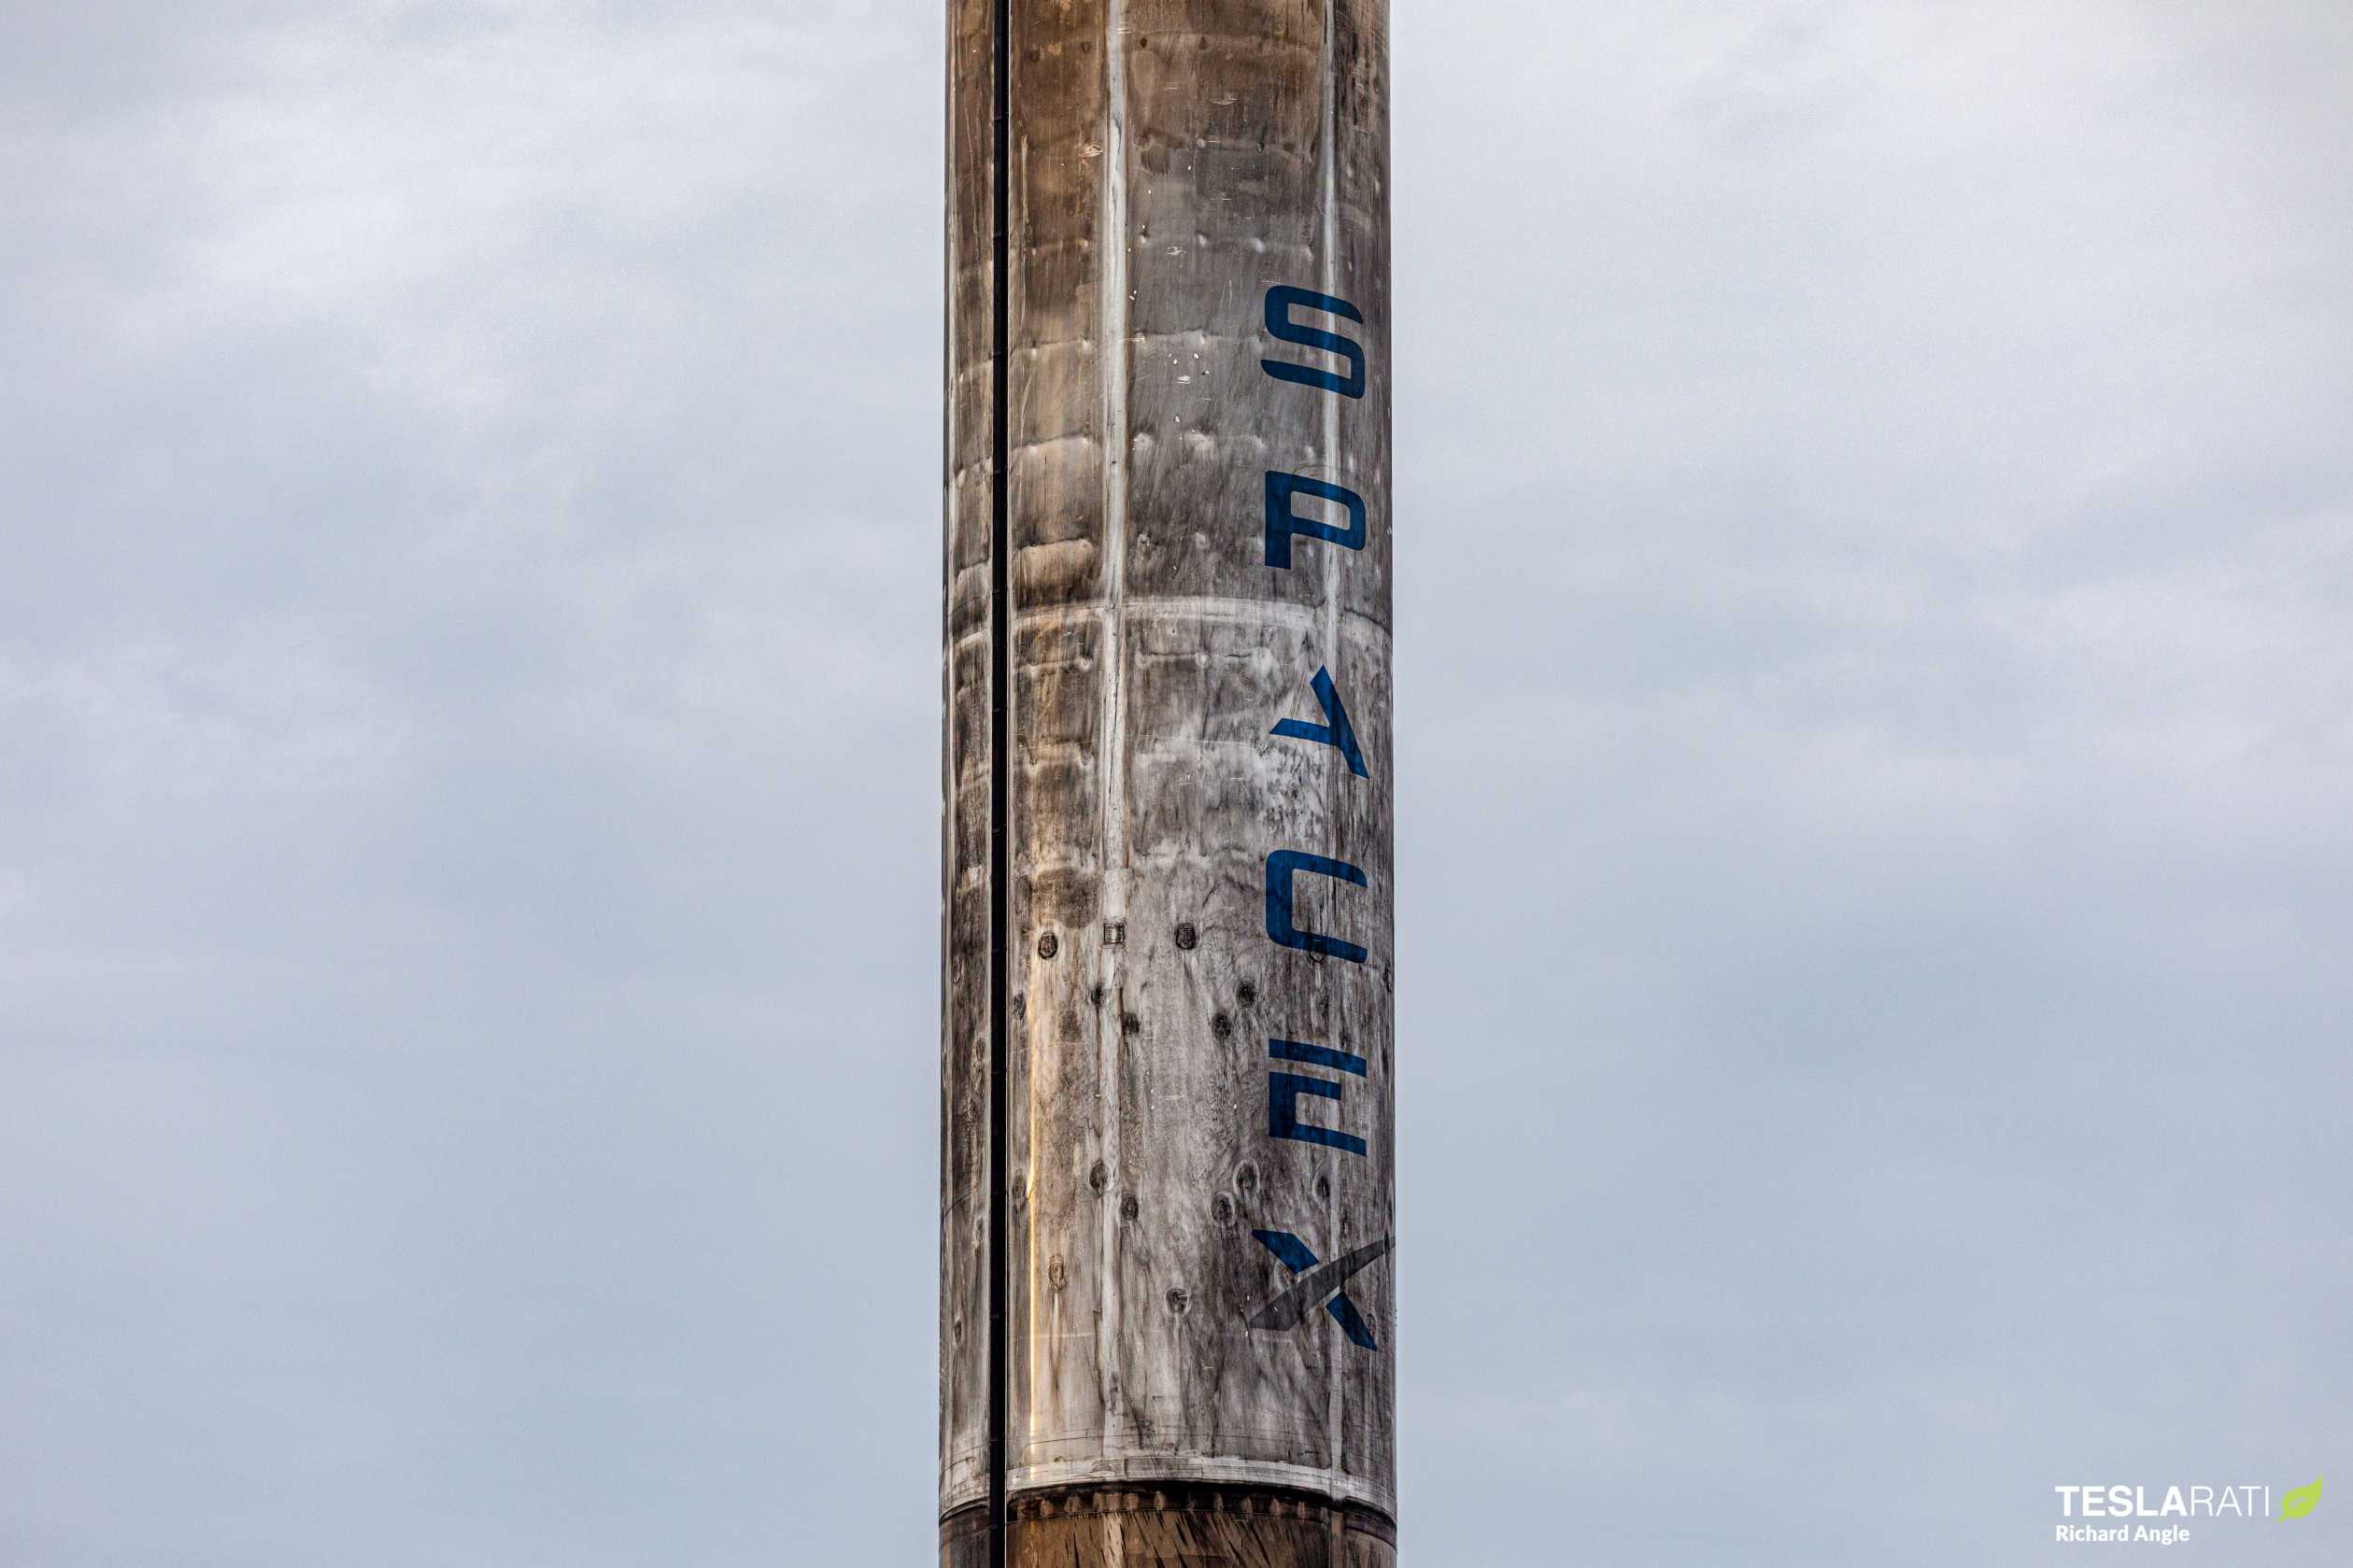 Starlink V1 L7 Falcon 9 B1049 JRTI return 060720 (Richard Angle) (2) (c)